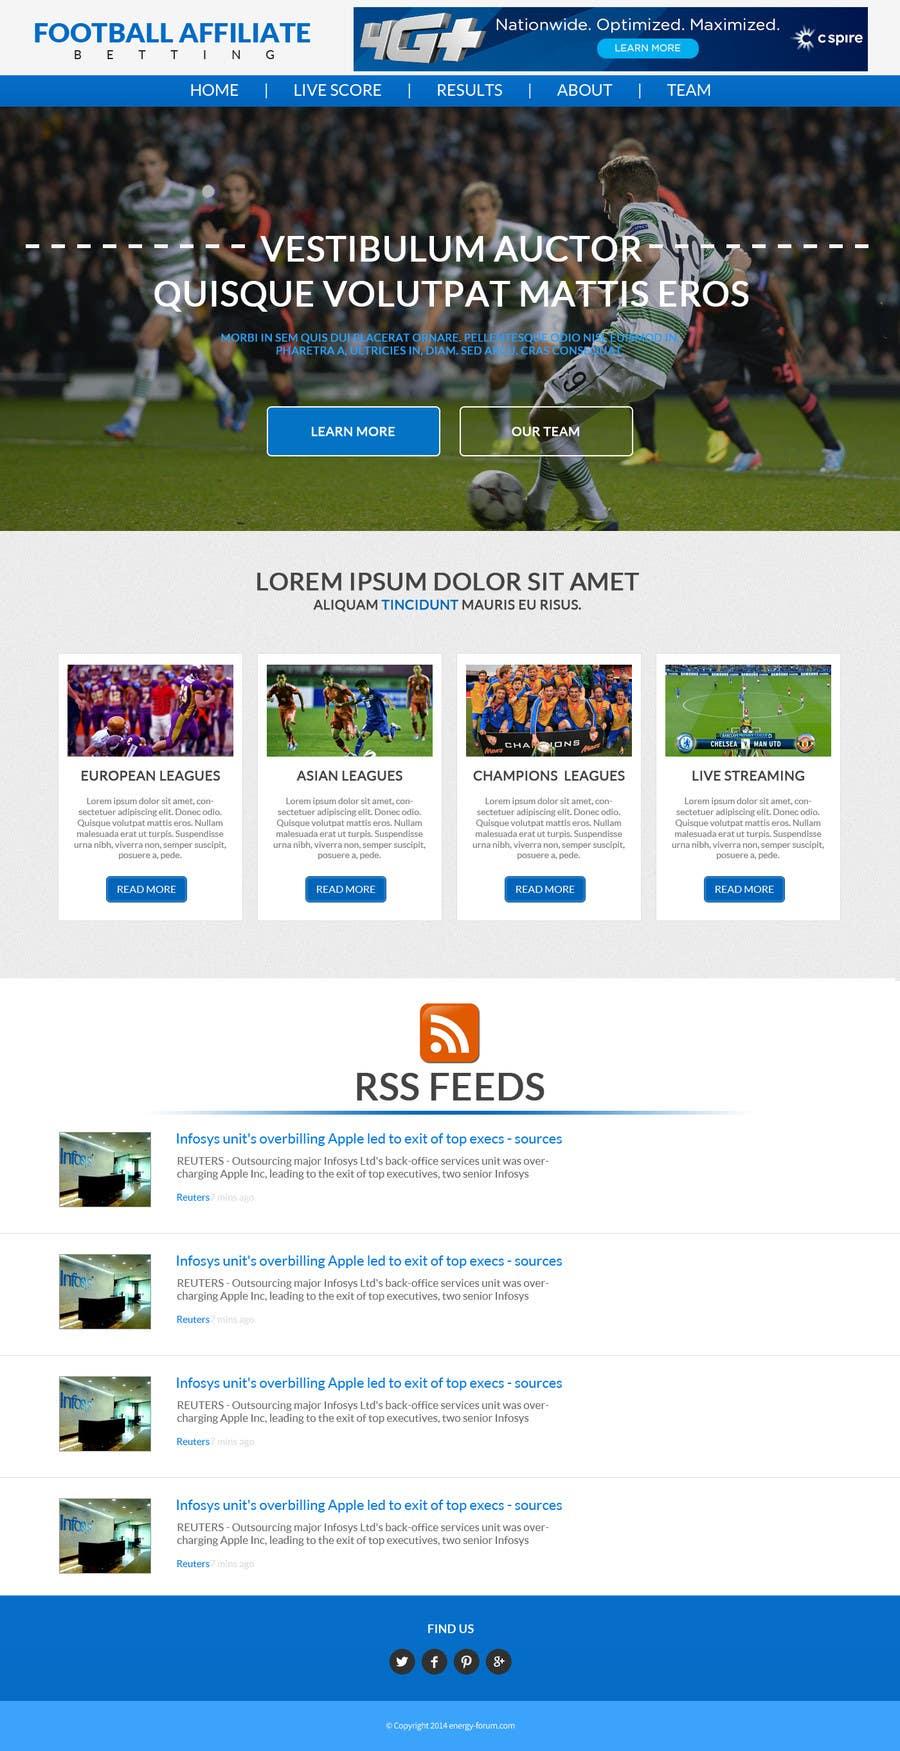 Bài tham dự cuộc thi #                                        3                                      cho                                         Homepage Mockup for a football affiliate betting site